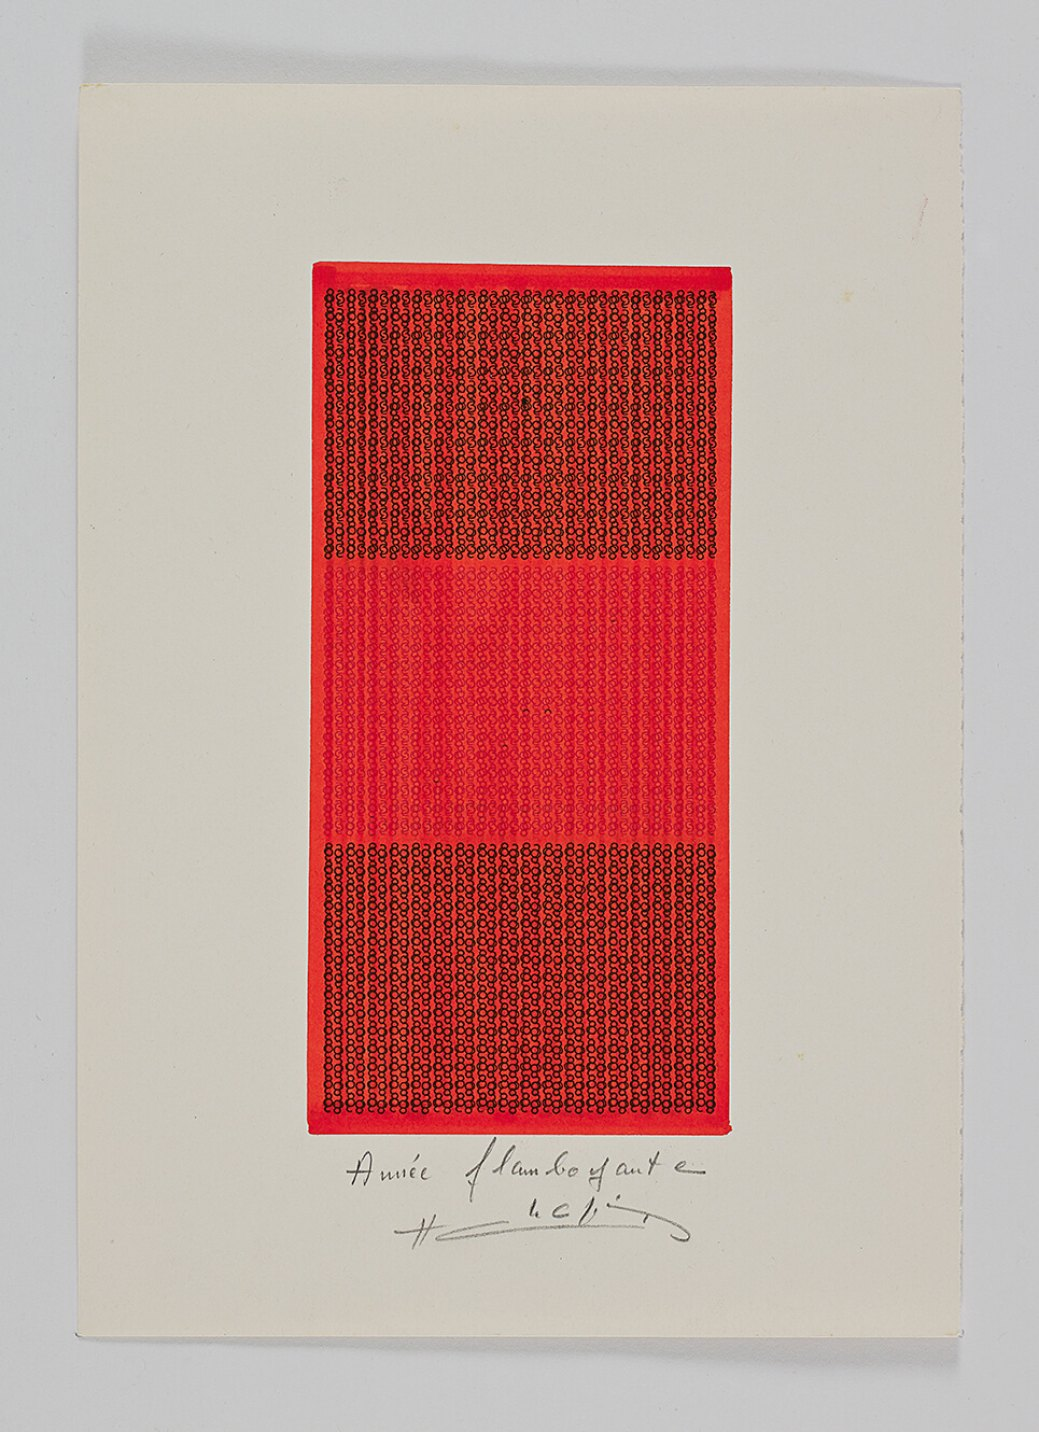 Henri Chopin,<em>Année flamboyante</em>, 1983,ink on paper (typewritten poems), 29.7 × 21 cm - Mendes Wood DM